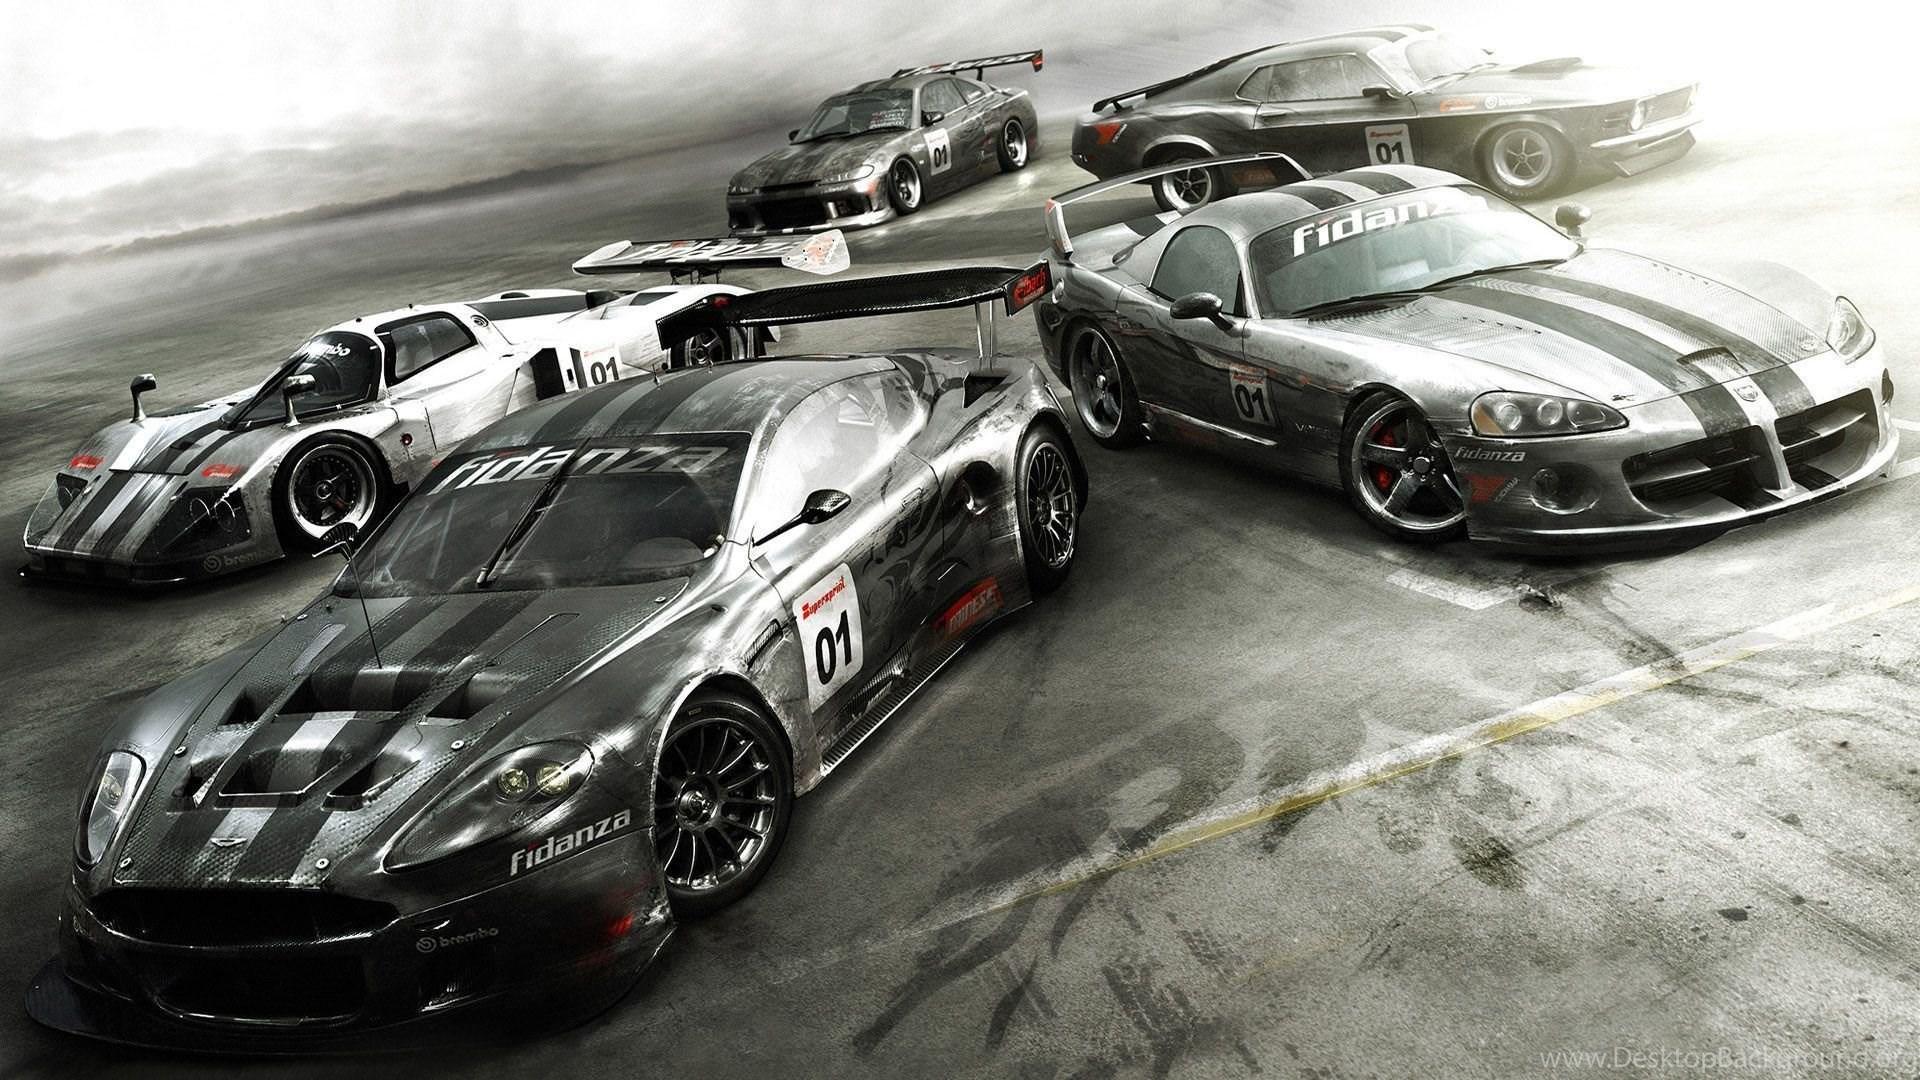 Cool Cars Wallpapers Desktop Background